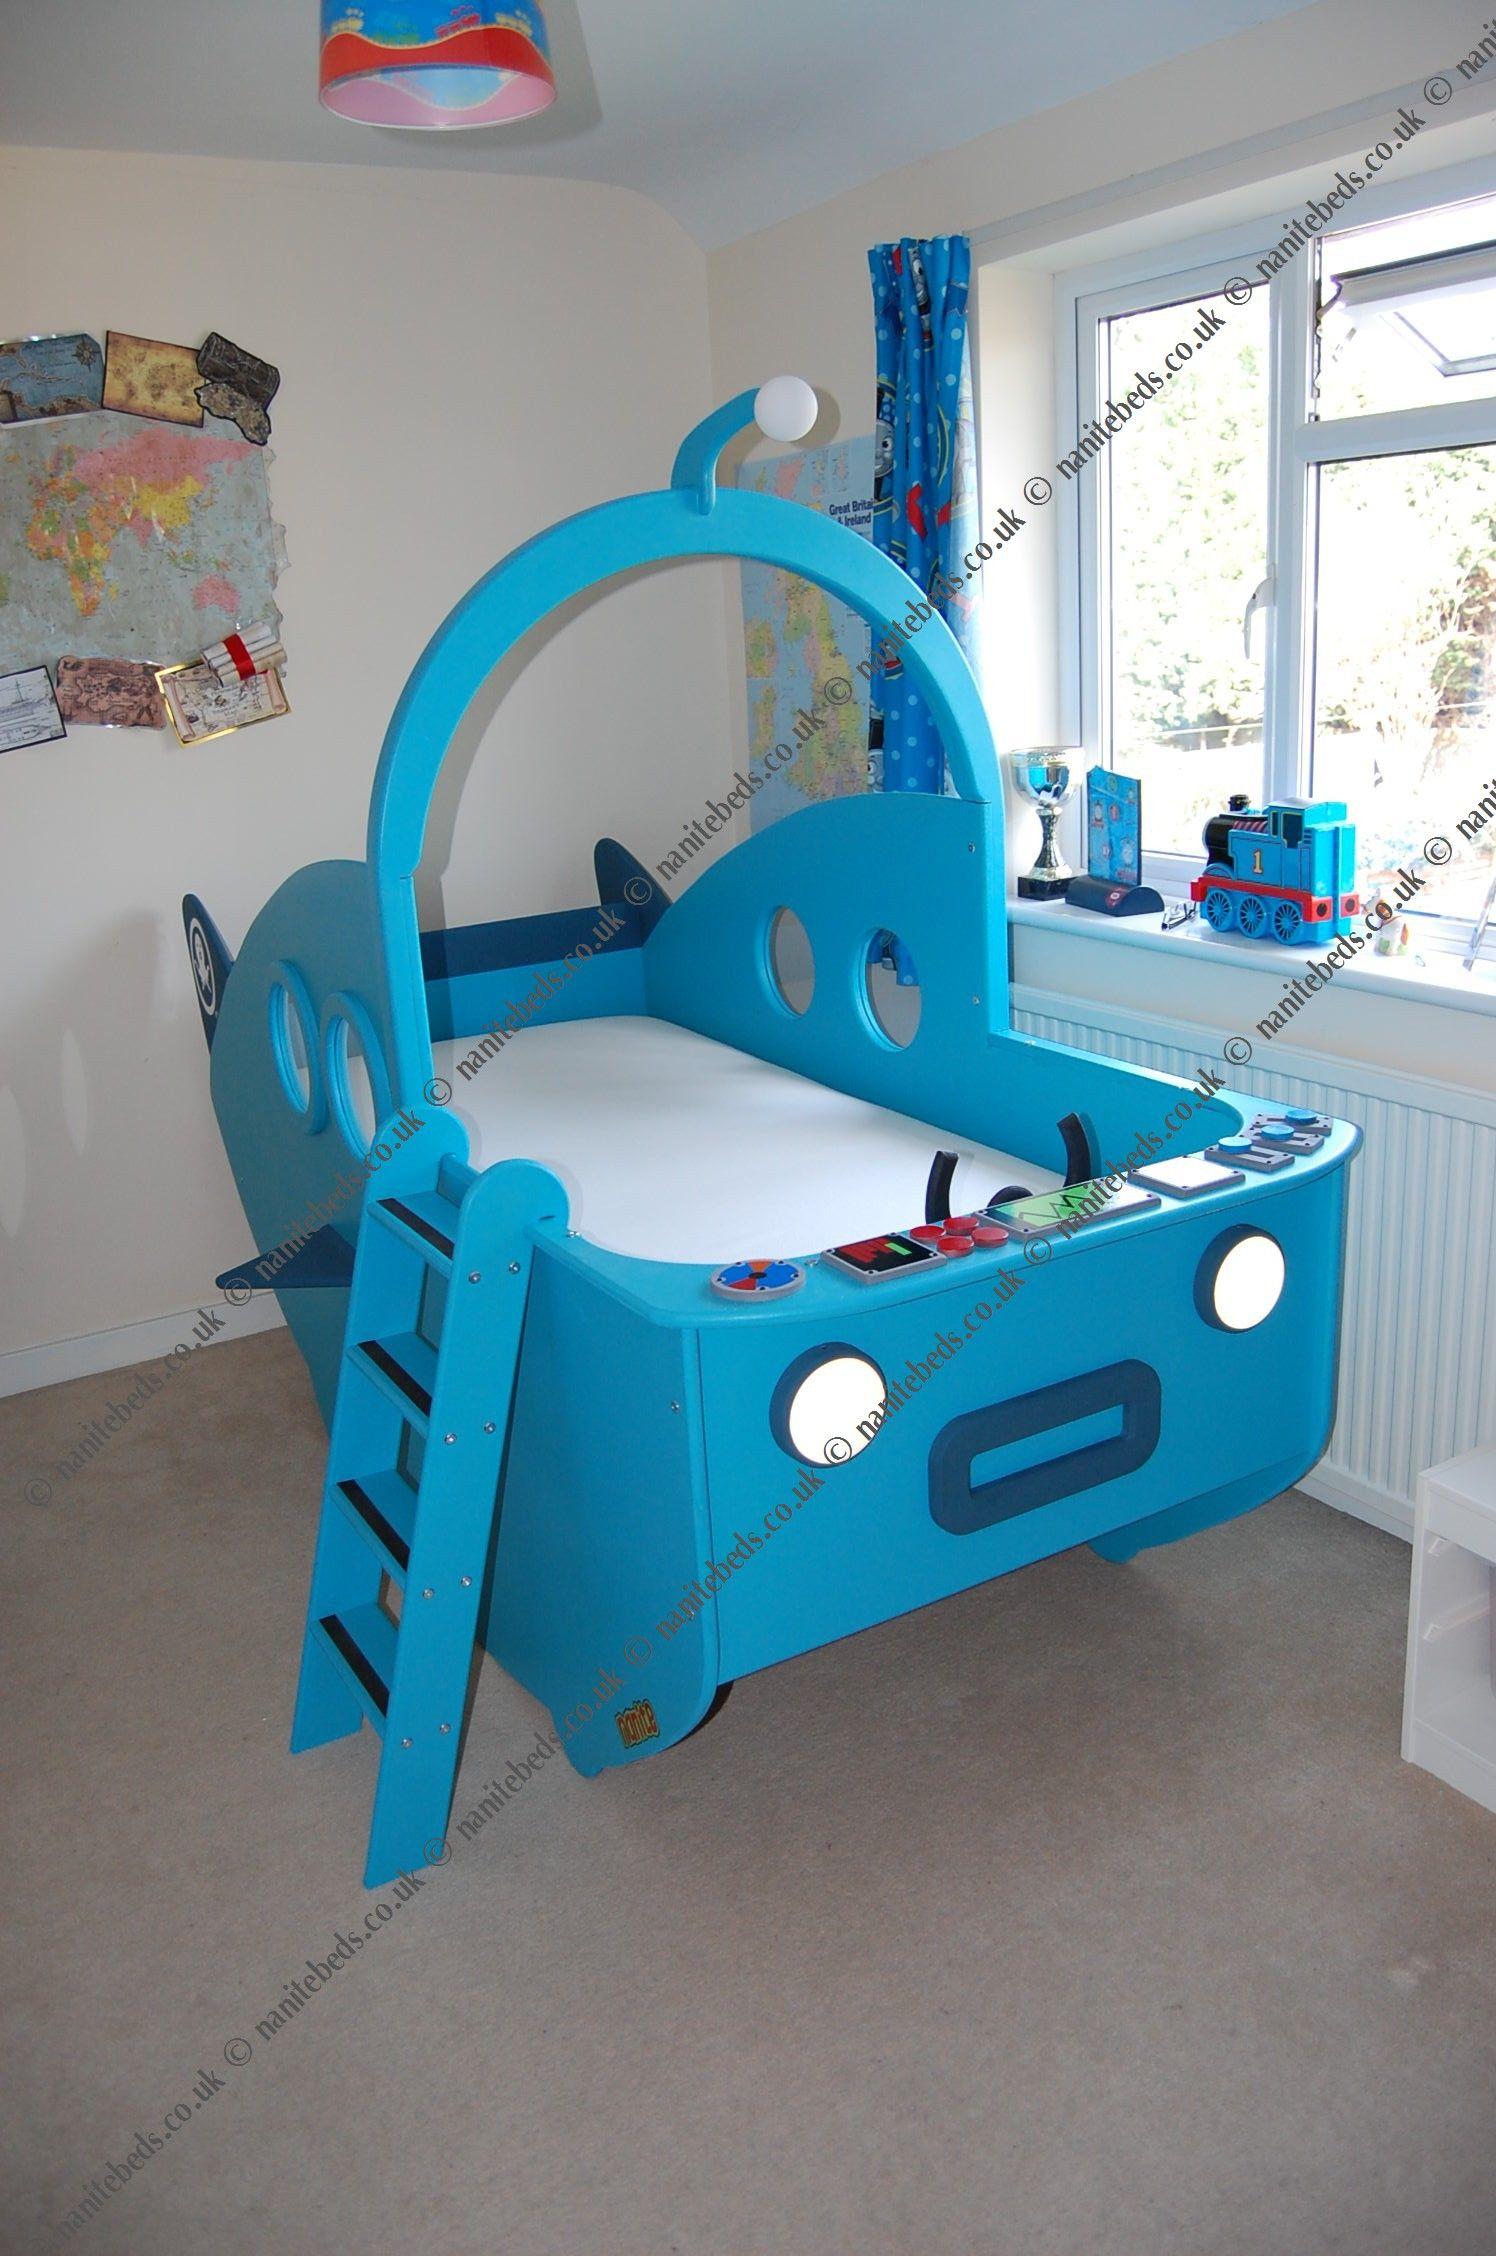 Octonauts Bedroom Decor My Sons Dream An Octonauts Gup A Bed Octonauts Pinterest